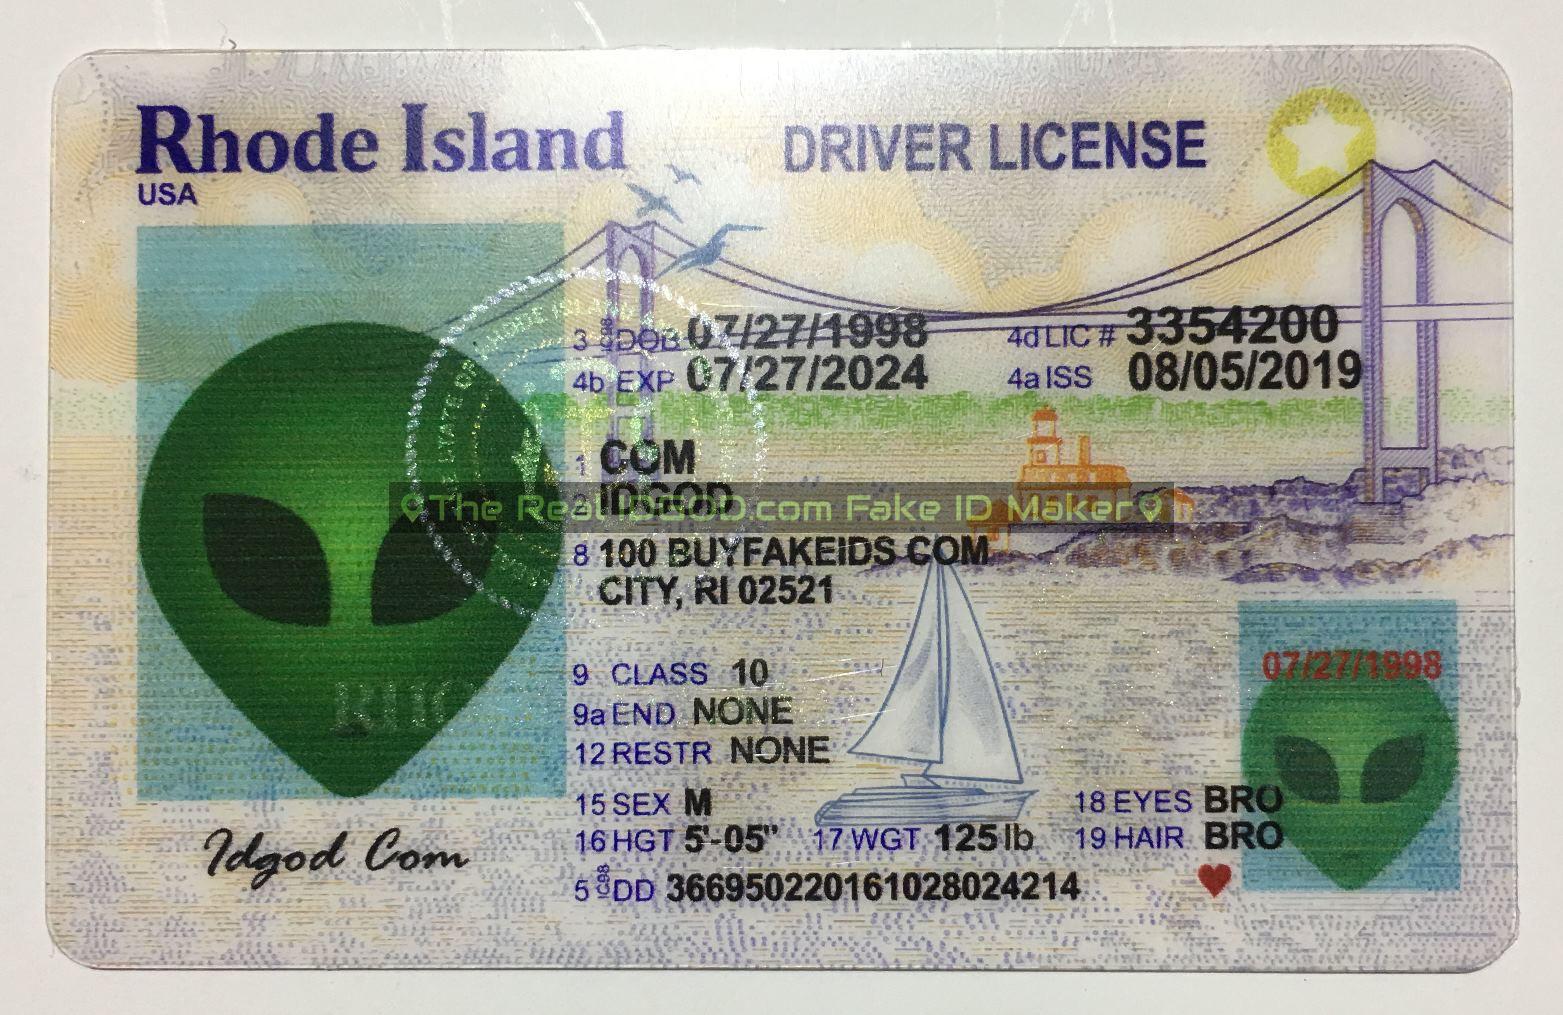 Rhode Island fake id card made by Idgod